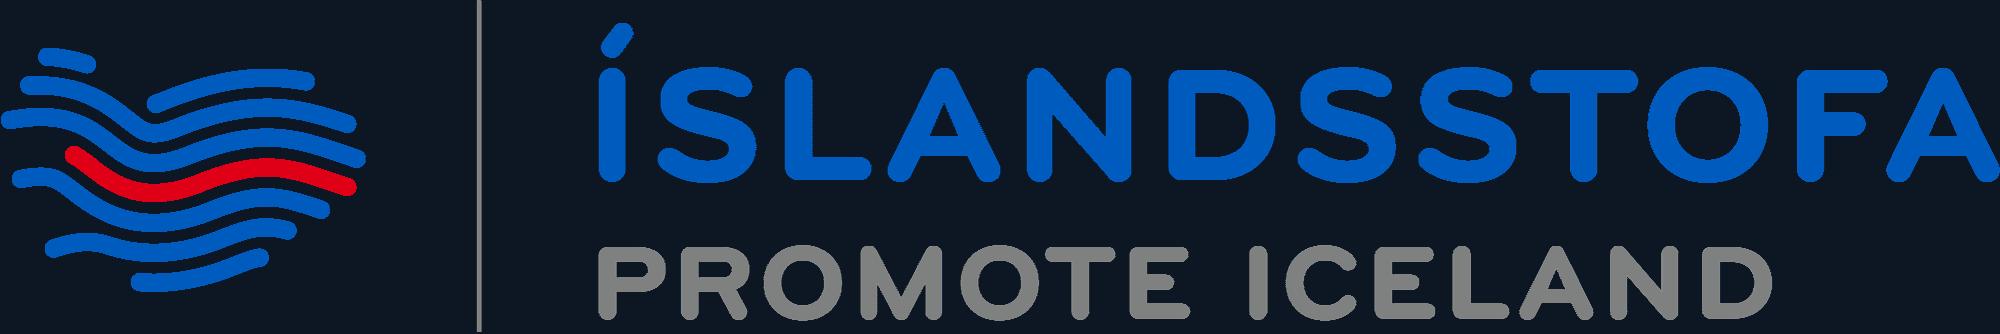 islandsstofa_promoteiceland_rgb-1